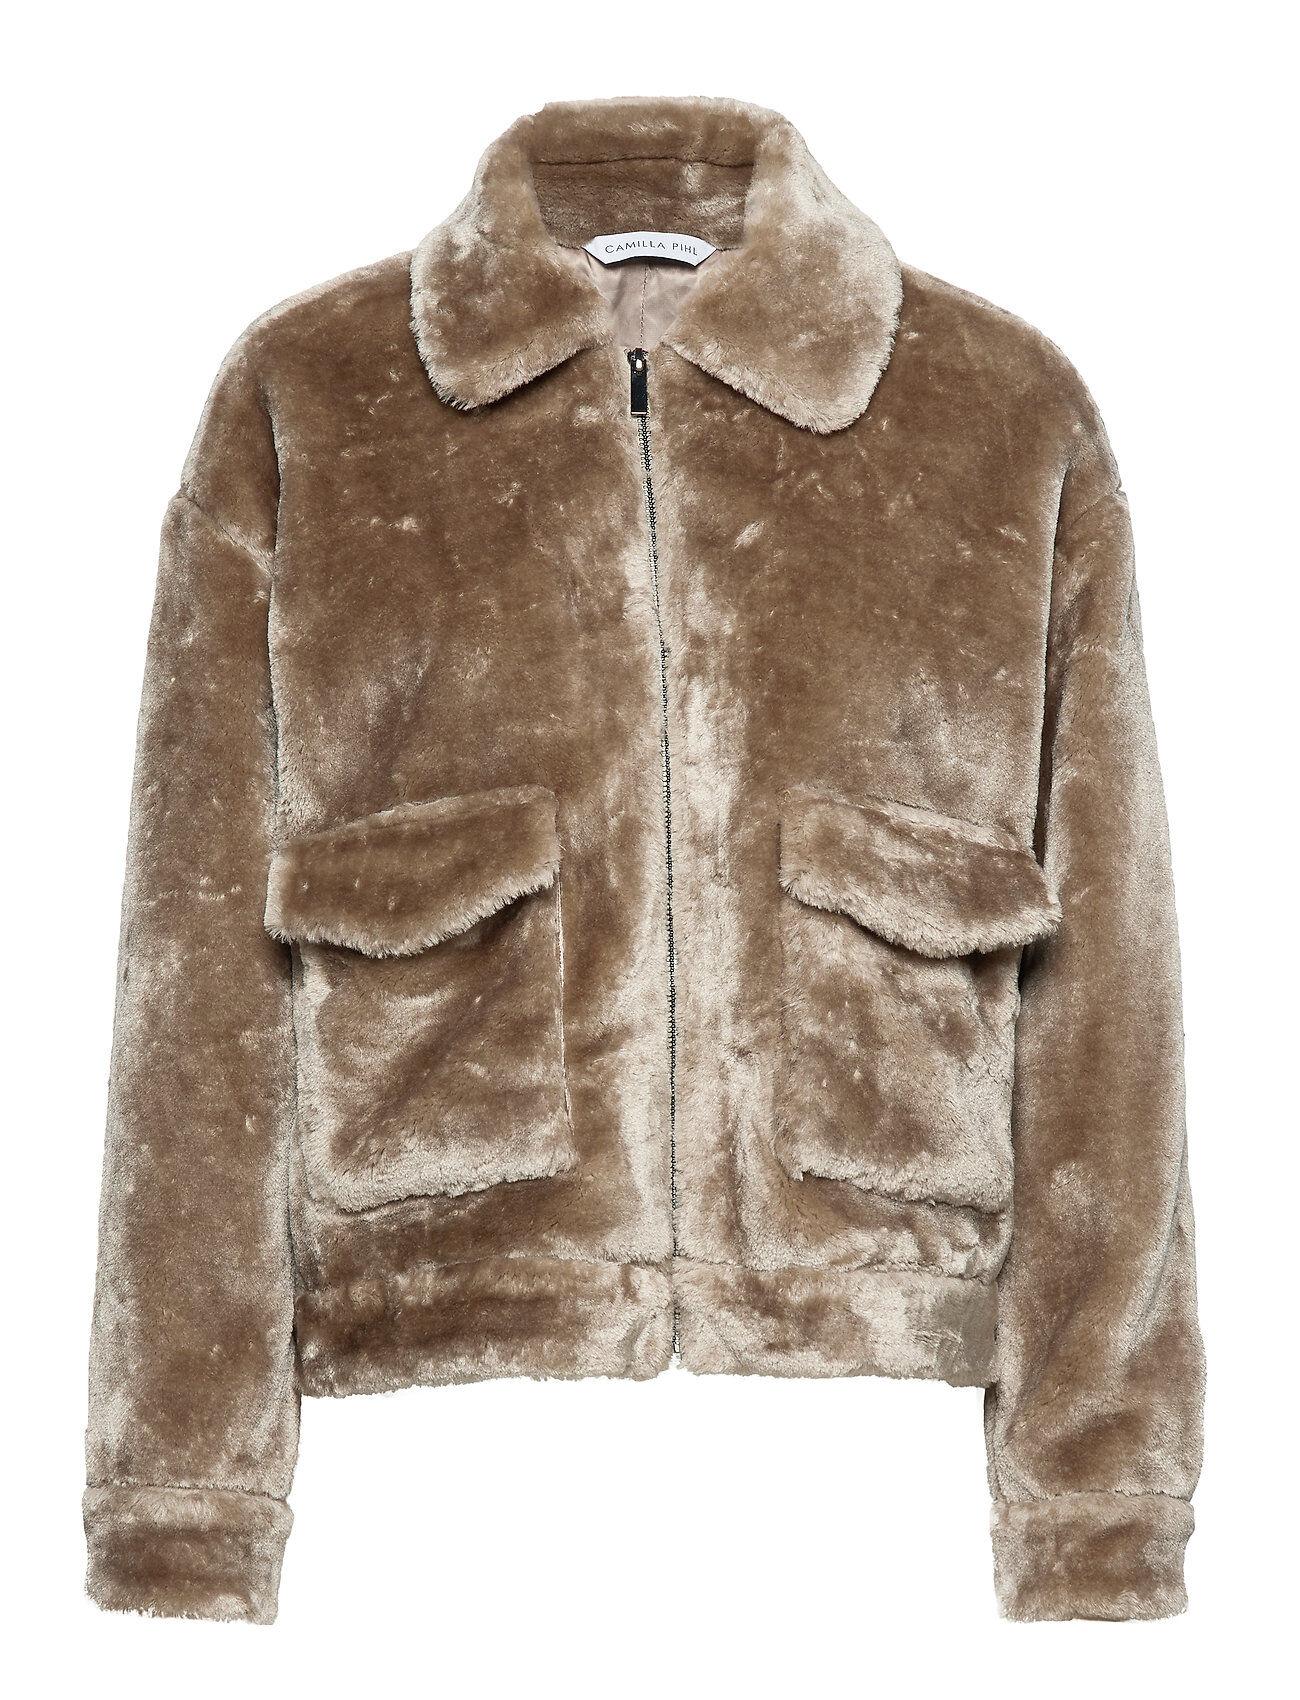 Camilla Pihl Teddy Outerwear Faux Fur Ruskea Camilla Pihl